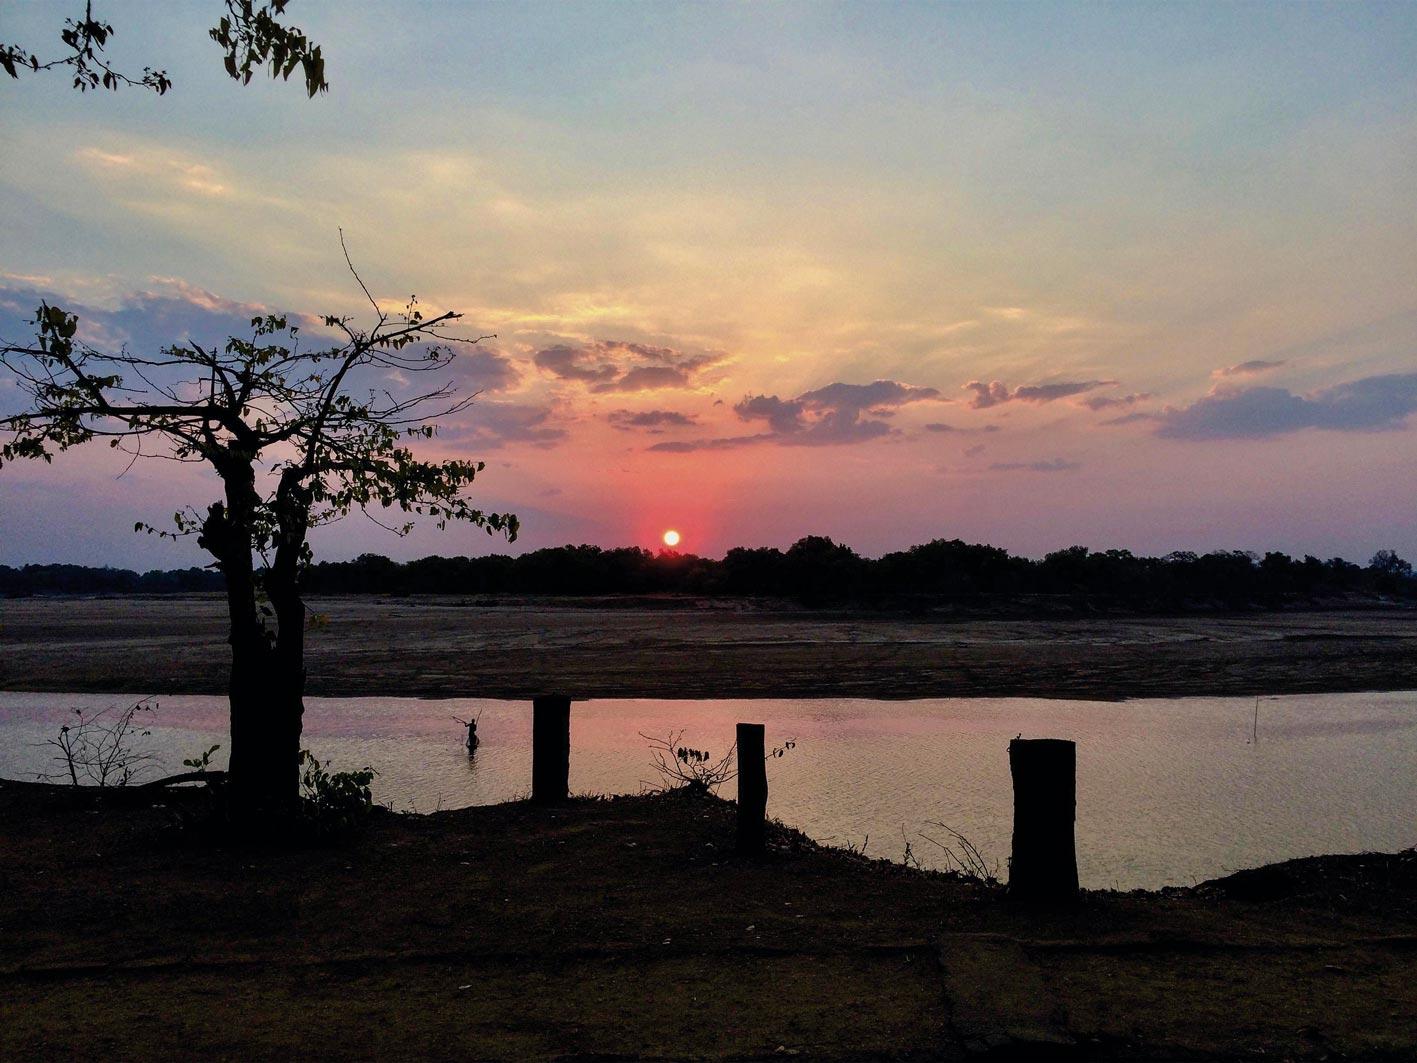 Sonnenuntergang in Zambia, Safari-Reise